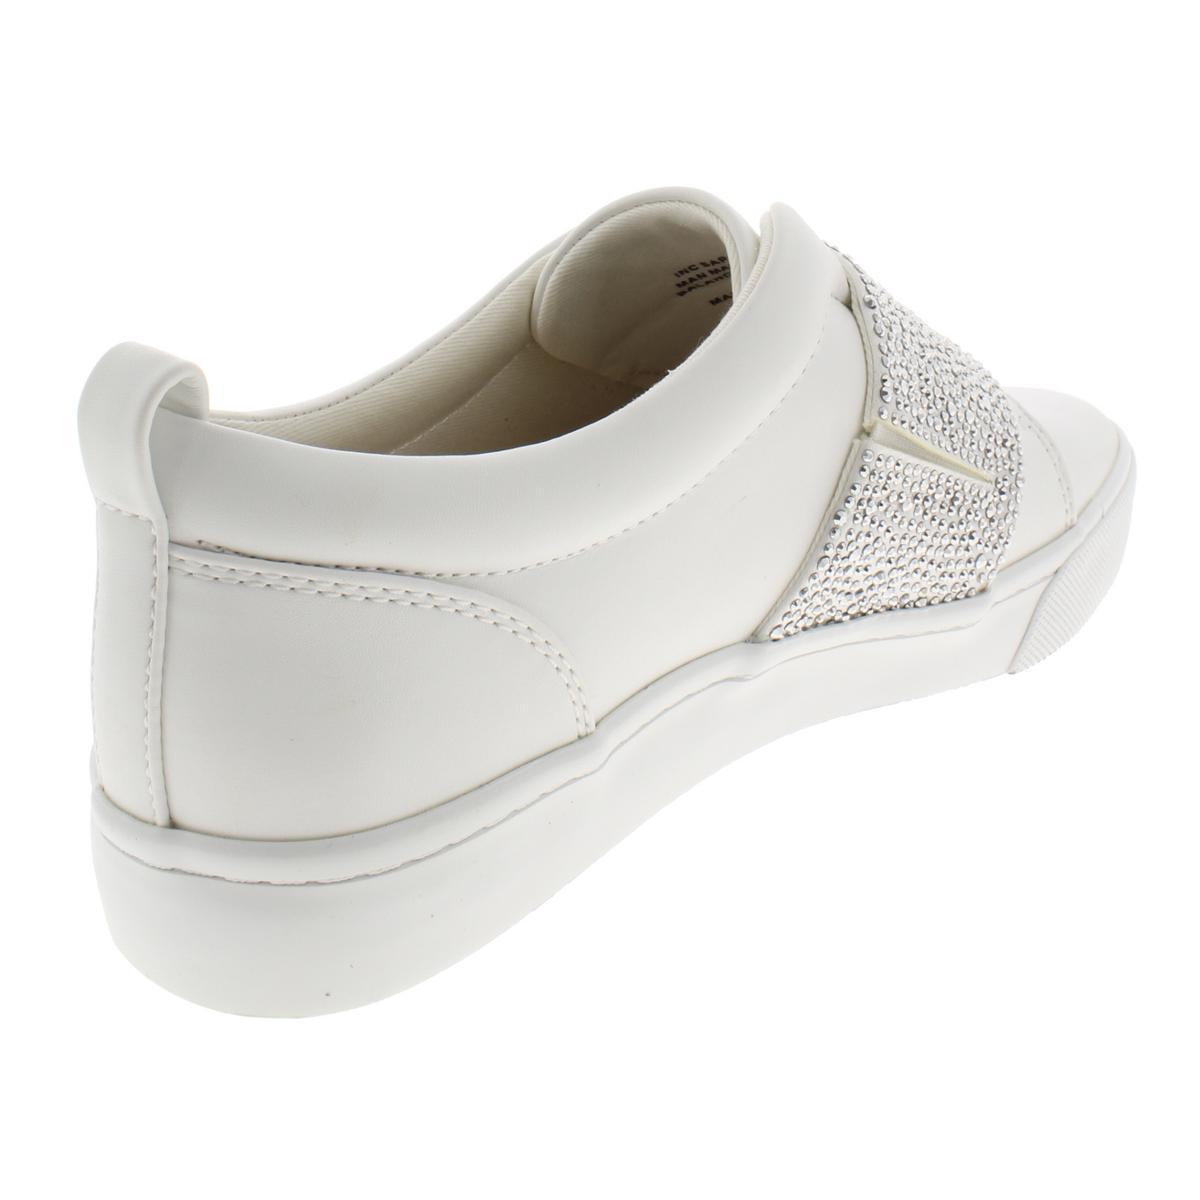 INC-Womens-Sapphira-Padded-Insole-Rhinestone-Casual-Shoes-Sneakers-BHFO-8988 thumbnail 4